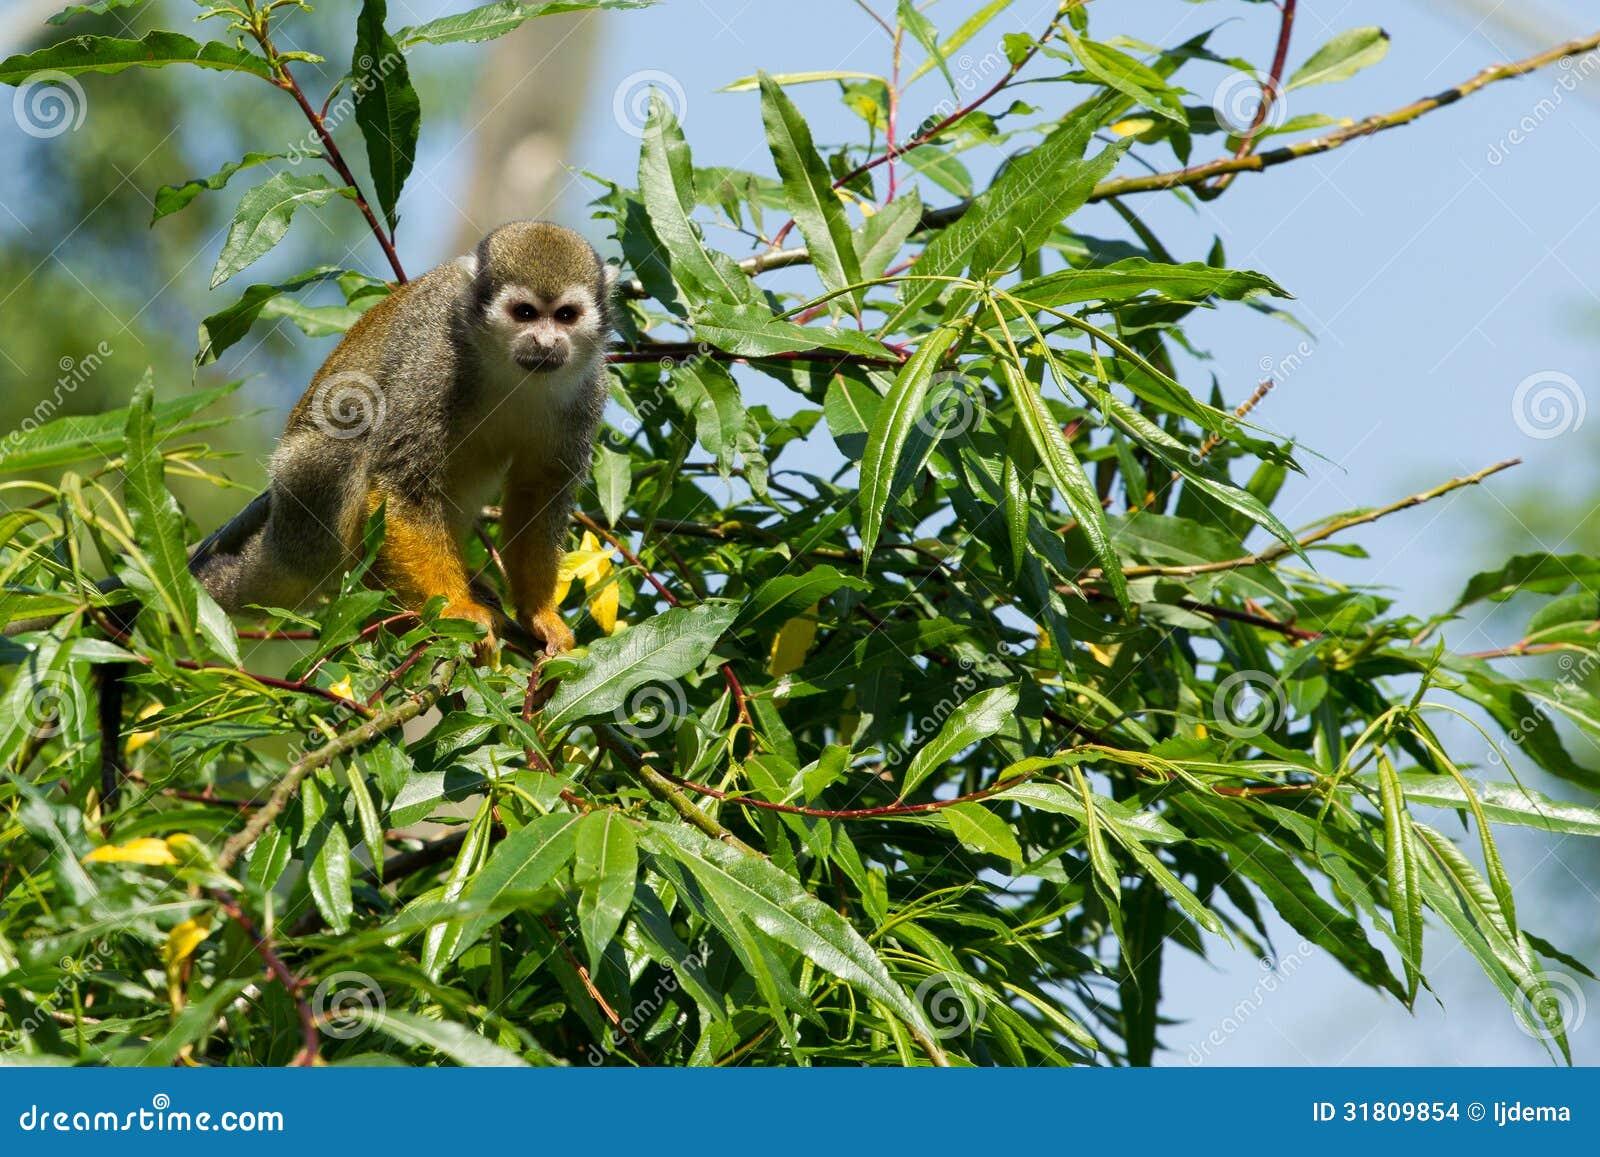 Squirrel monkeys in trees - photo#19